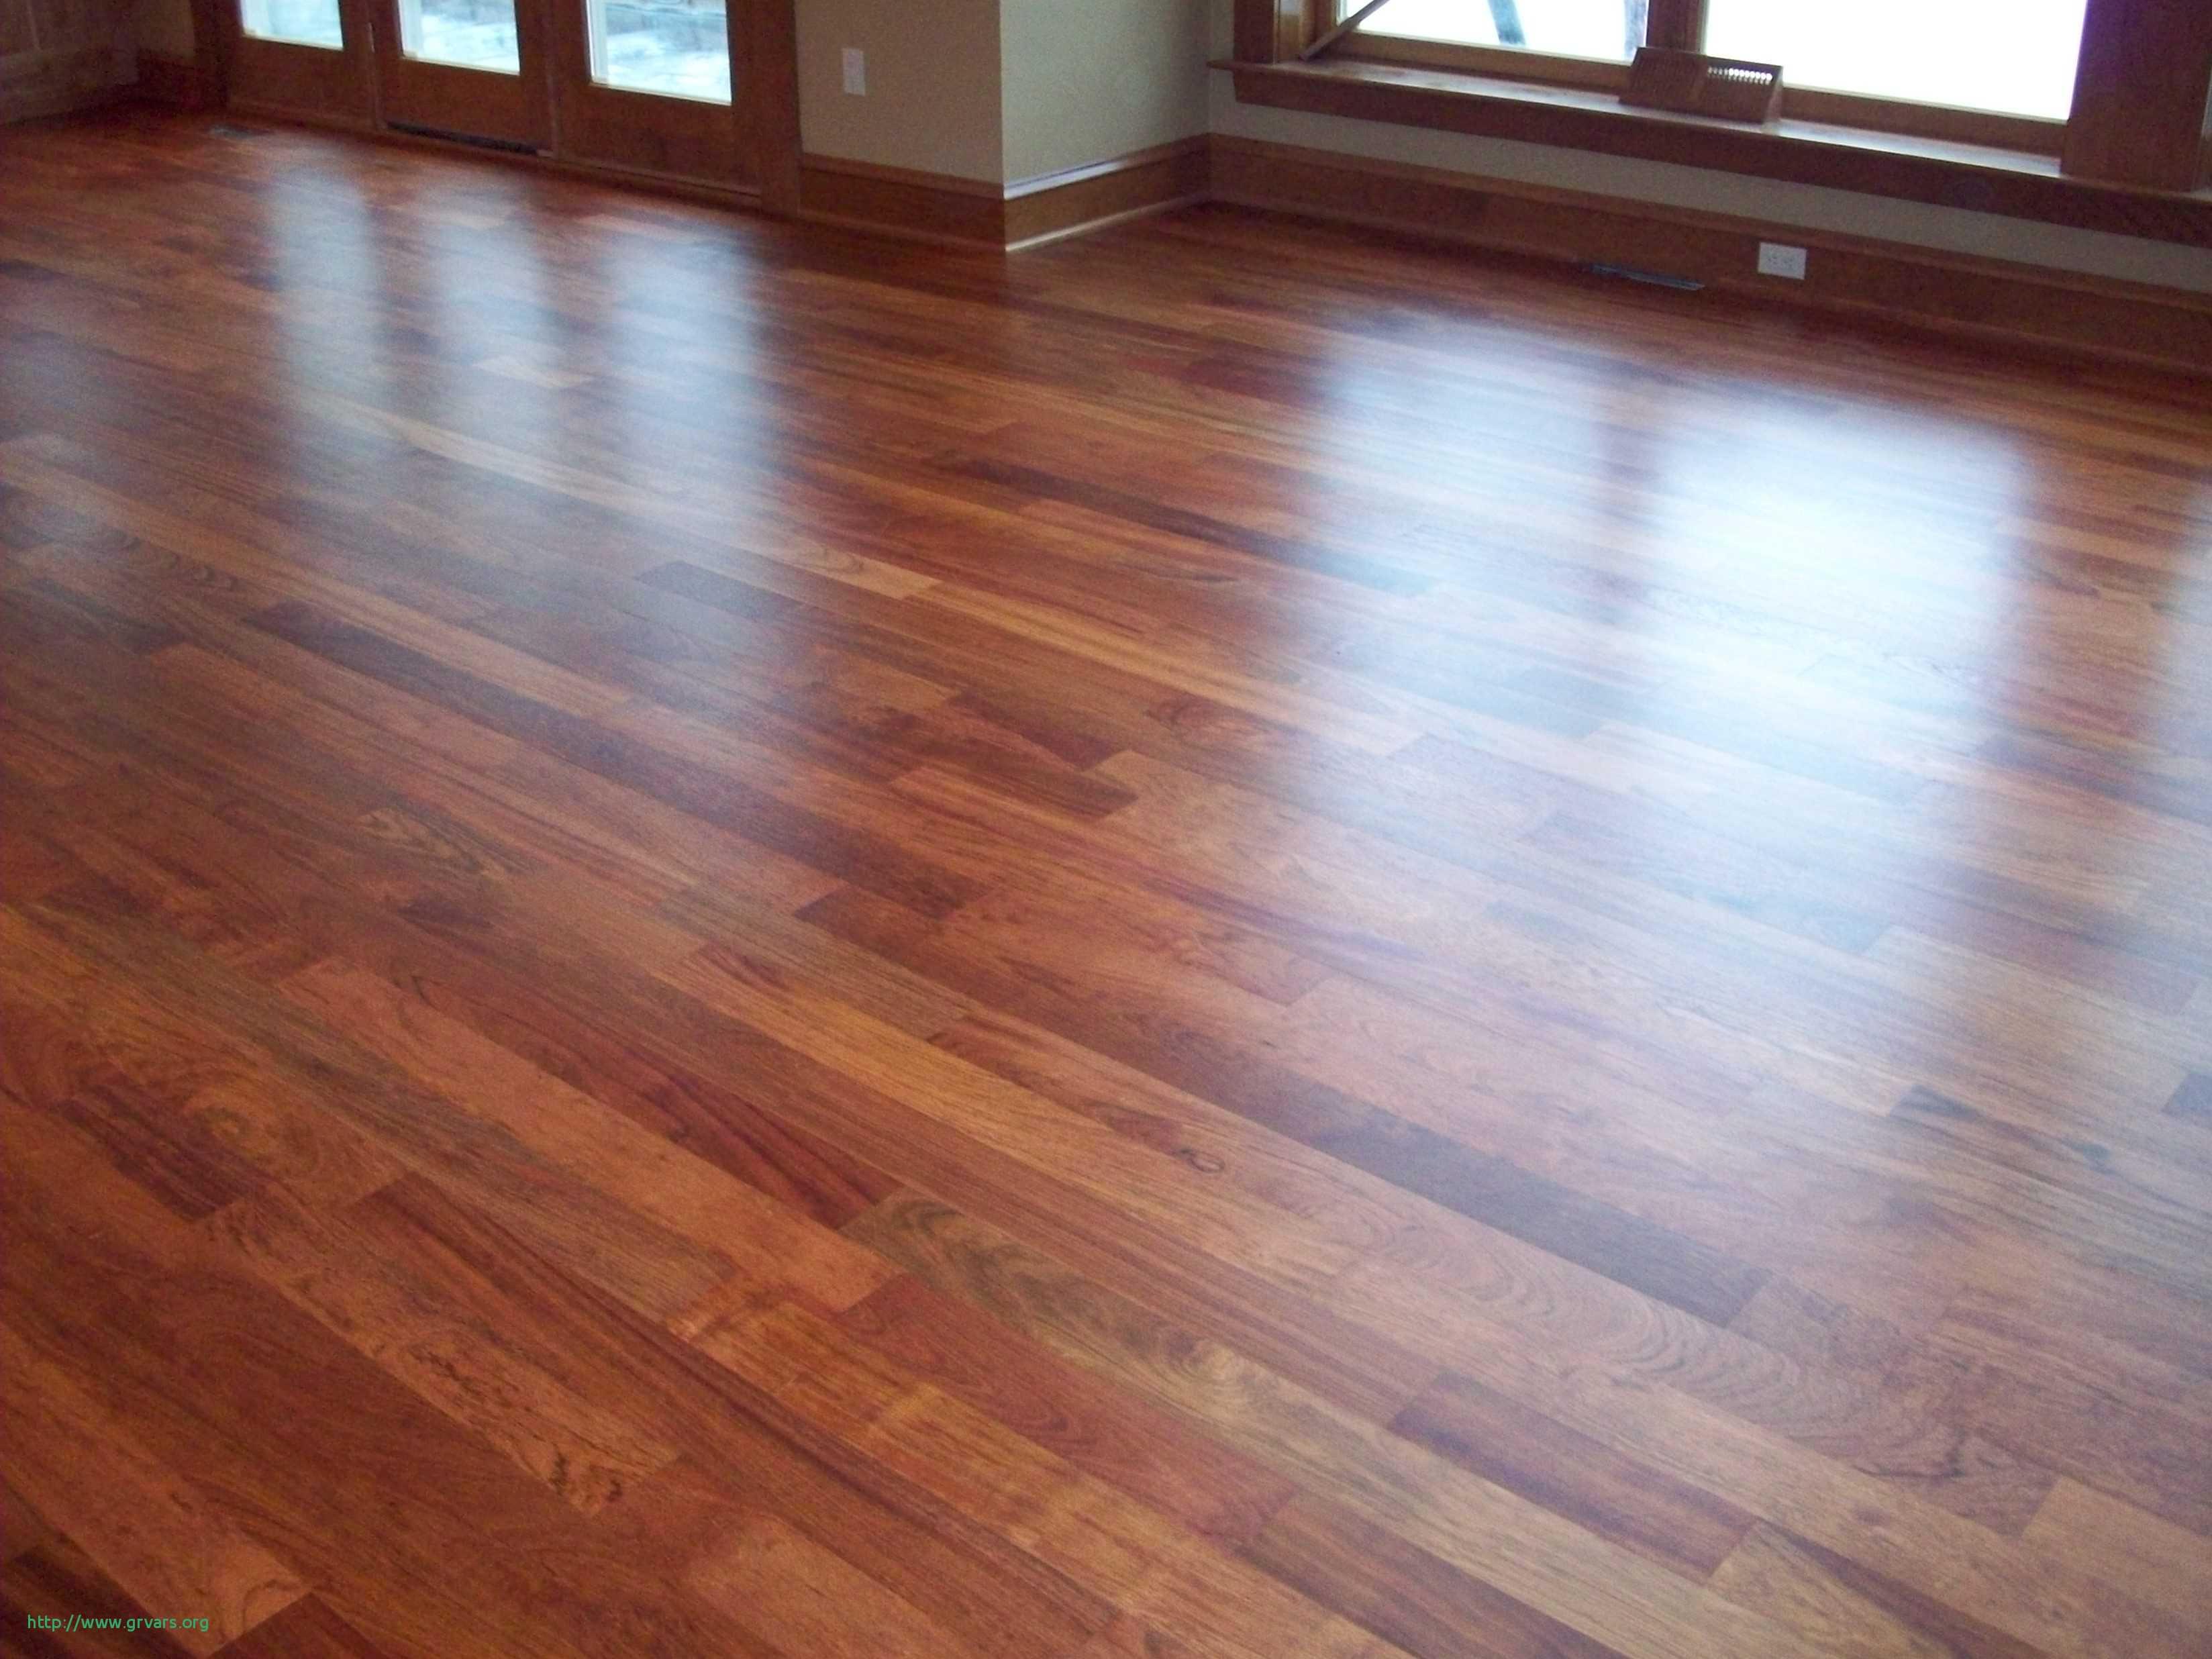 hardwood flooring warehouse toronto of discount hardwood flooring van nuys unique engaging discount in discount hardwood flooring van nuys luxe fabulous discount hardwood flooring 0 floor brampton 25 toronto